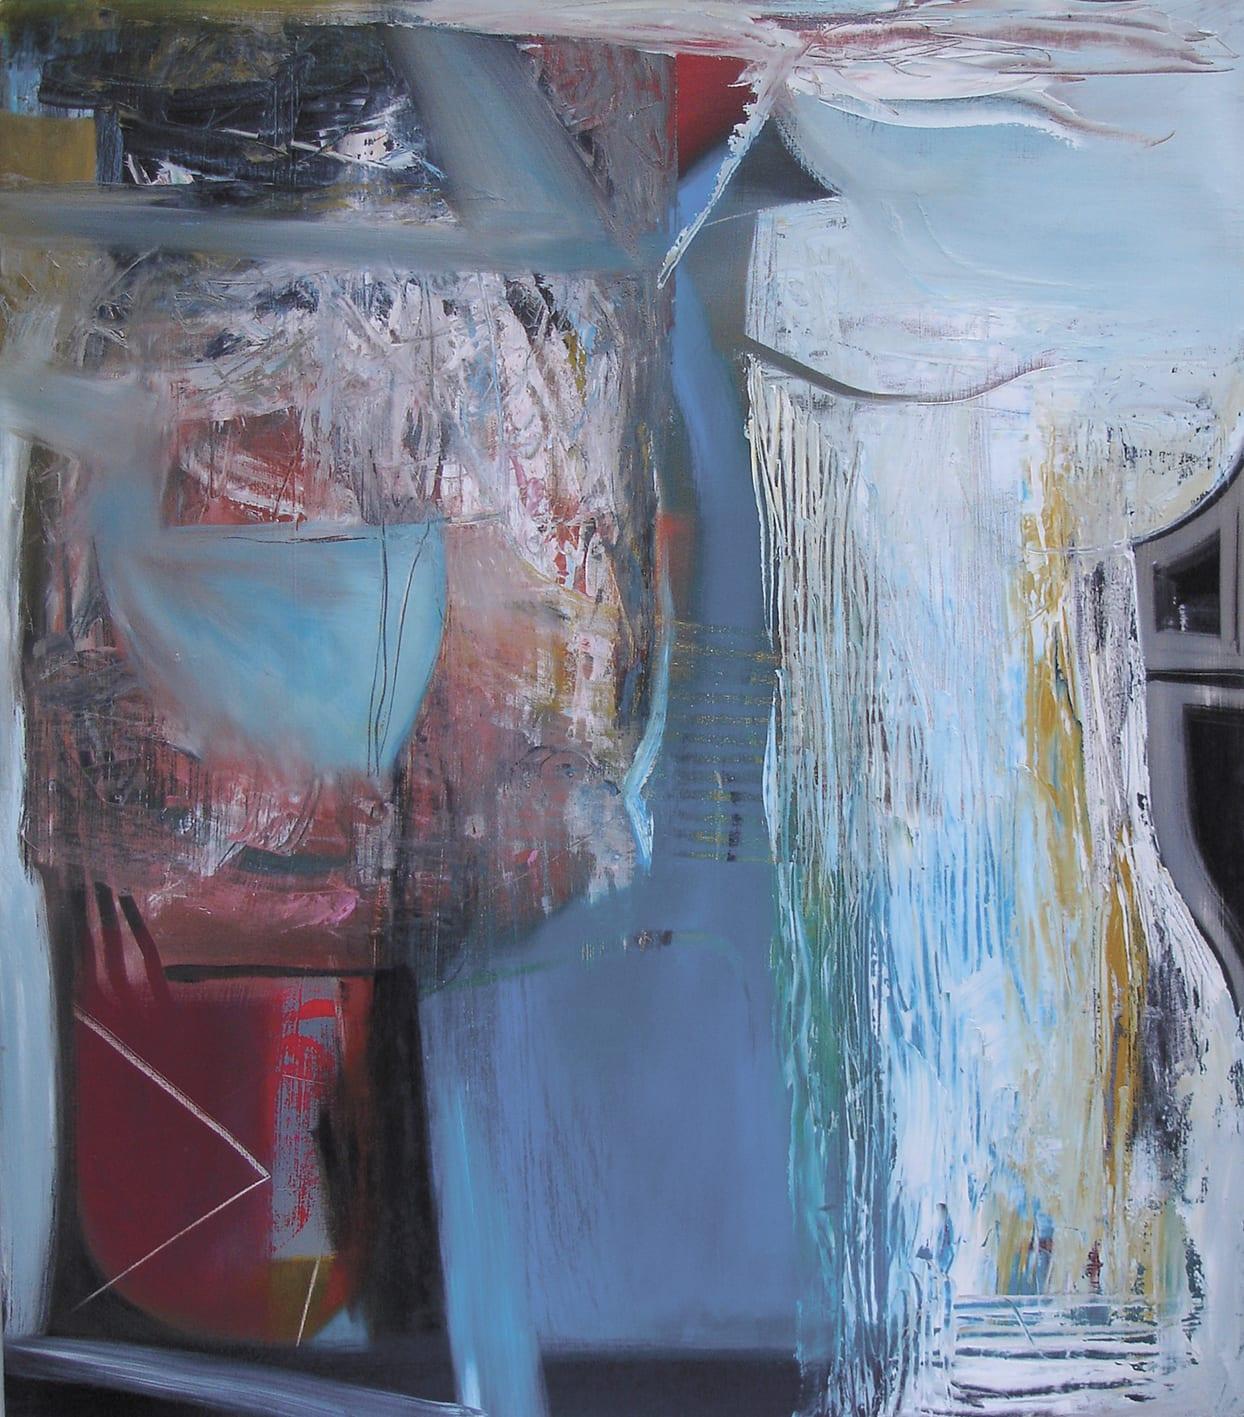 "<span class=""link fancybox-details-link""><a href=""/artists/45-matthew-lanyon/works/4115-matthew-lanyon-europa-x-2003/"">View Detail Page</a></span><div class=""artist""><strong>Matthew Lanyon</strong></div> 1951 –2016 <div class=""title""><em>Europa X</em>, 2003</div> <div class=""signed_and_dated"">signed, titled and dated on reverse board</div> <div class=""medium"">oil on board</div> <div class=""dimensions"">122 x 106 cm<br /> 48 1/8 x 41 3/4 inches</div><div class=""copyright_line"">@ The Estate of Matthew Lanyon</div>"